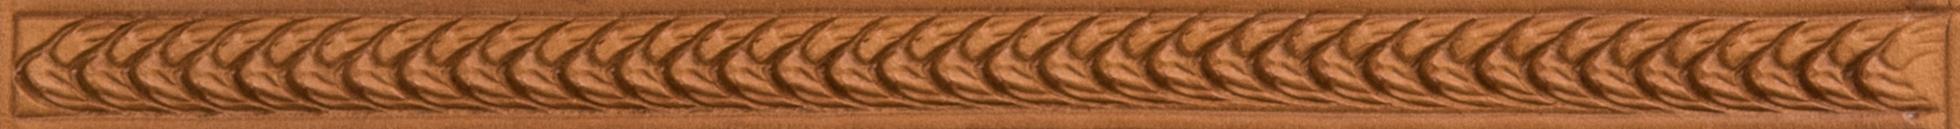 BT6240